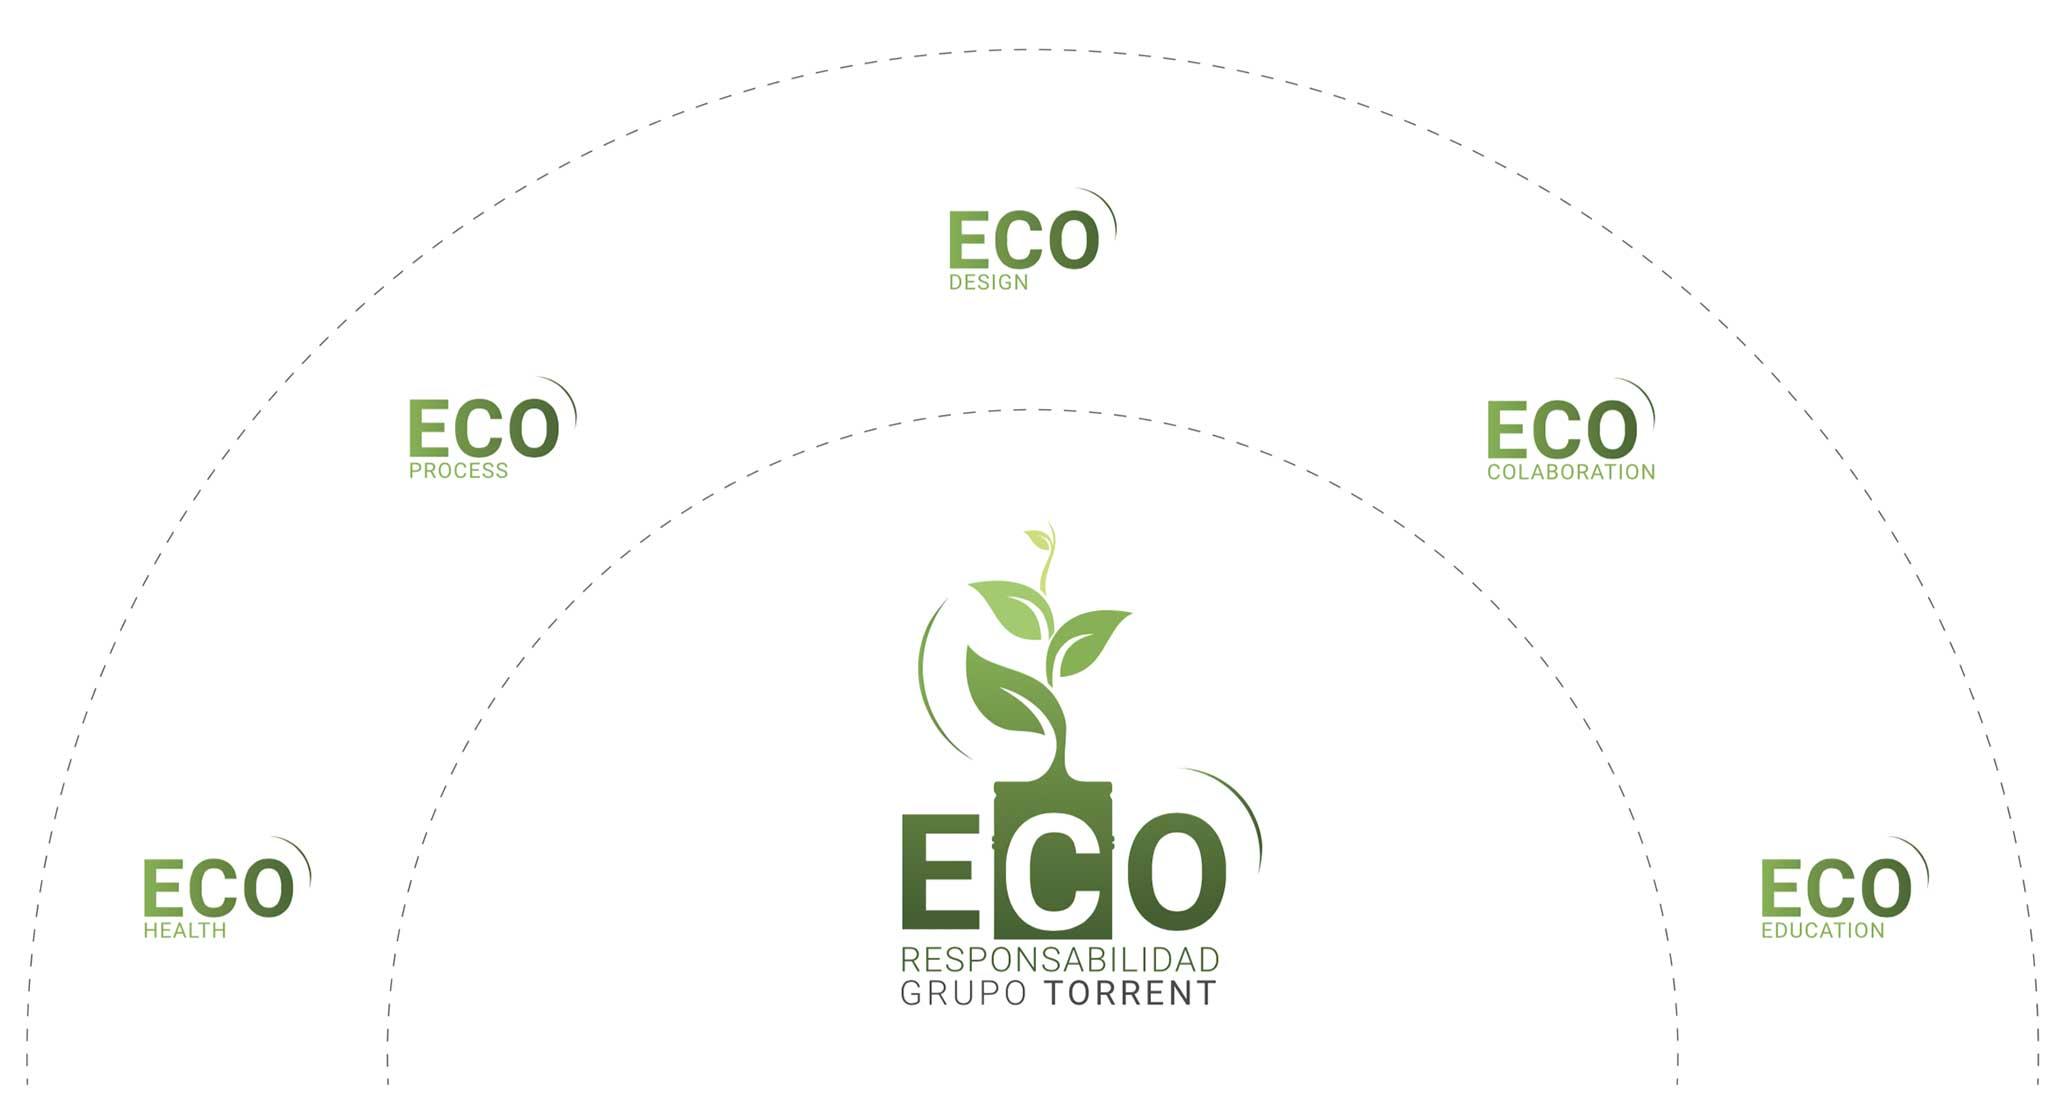 ecoresponsabilidad en | Grupo Torrent España